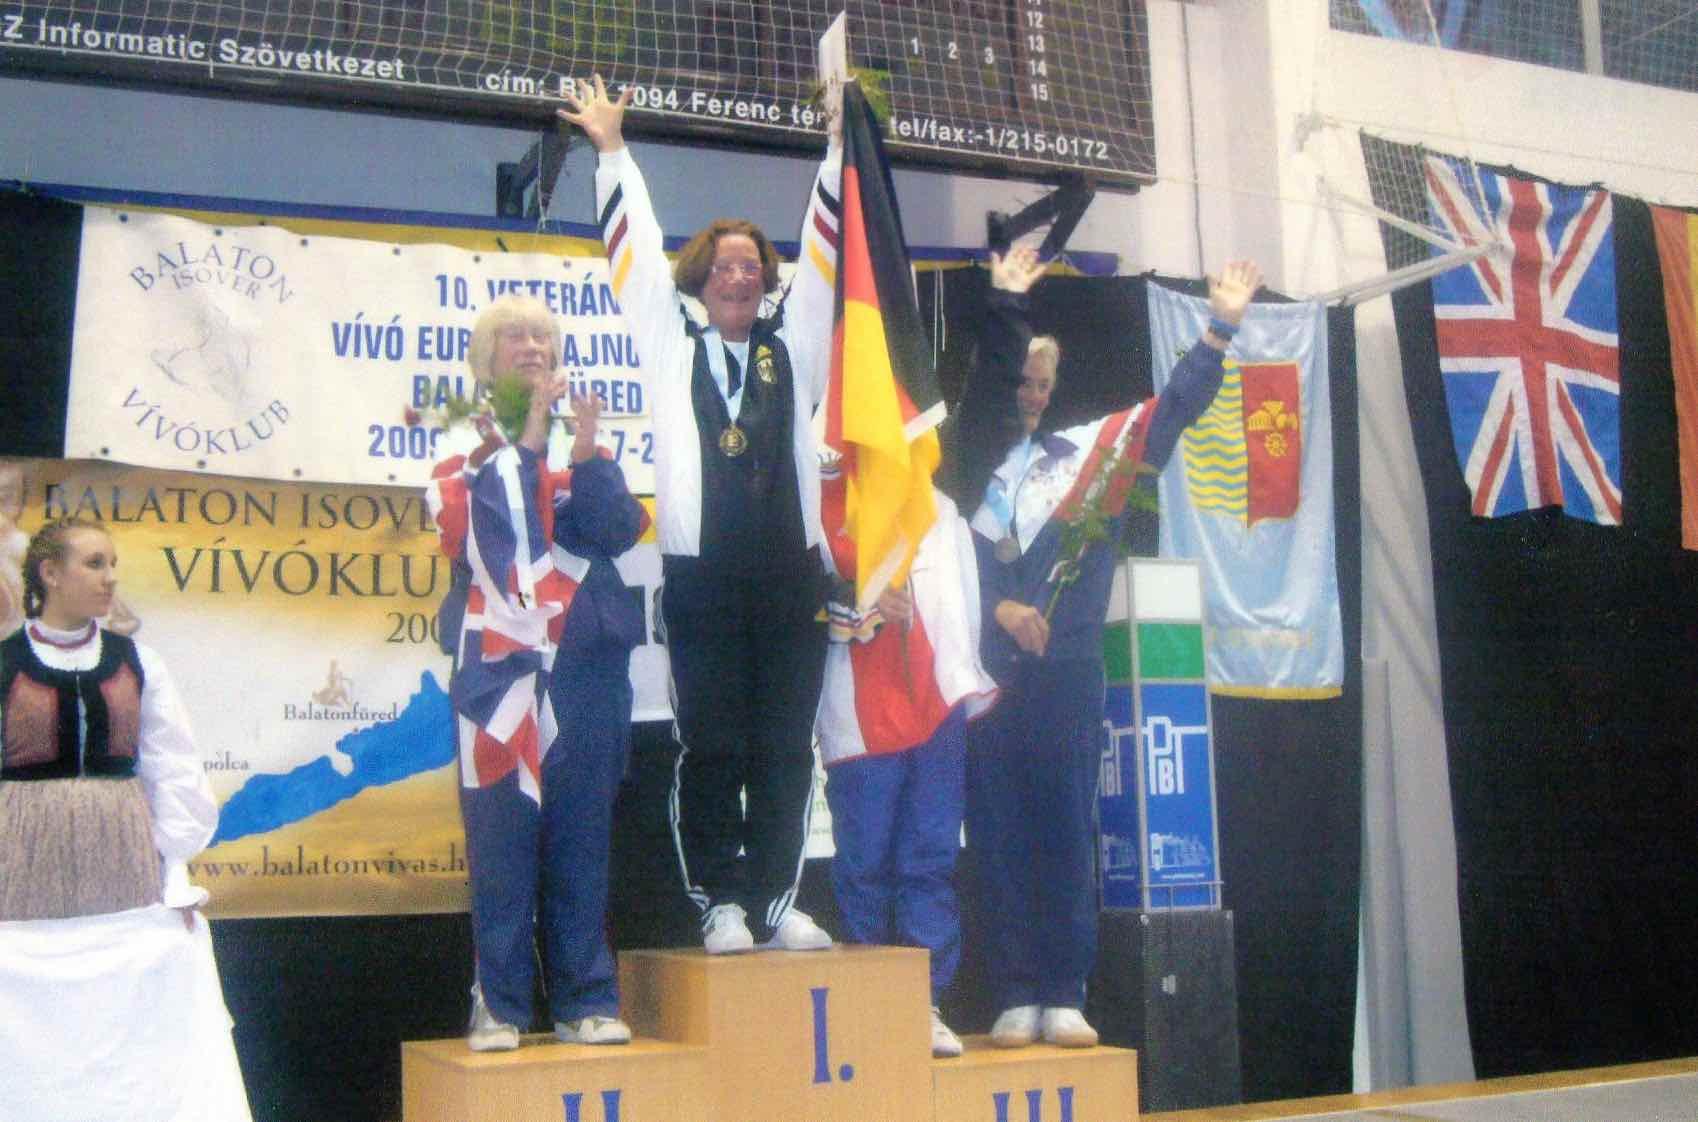 Balatonfürd 2009 (klein)